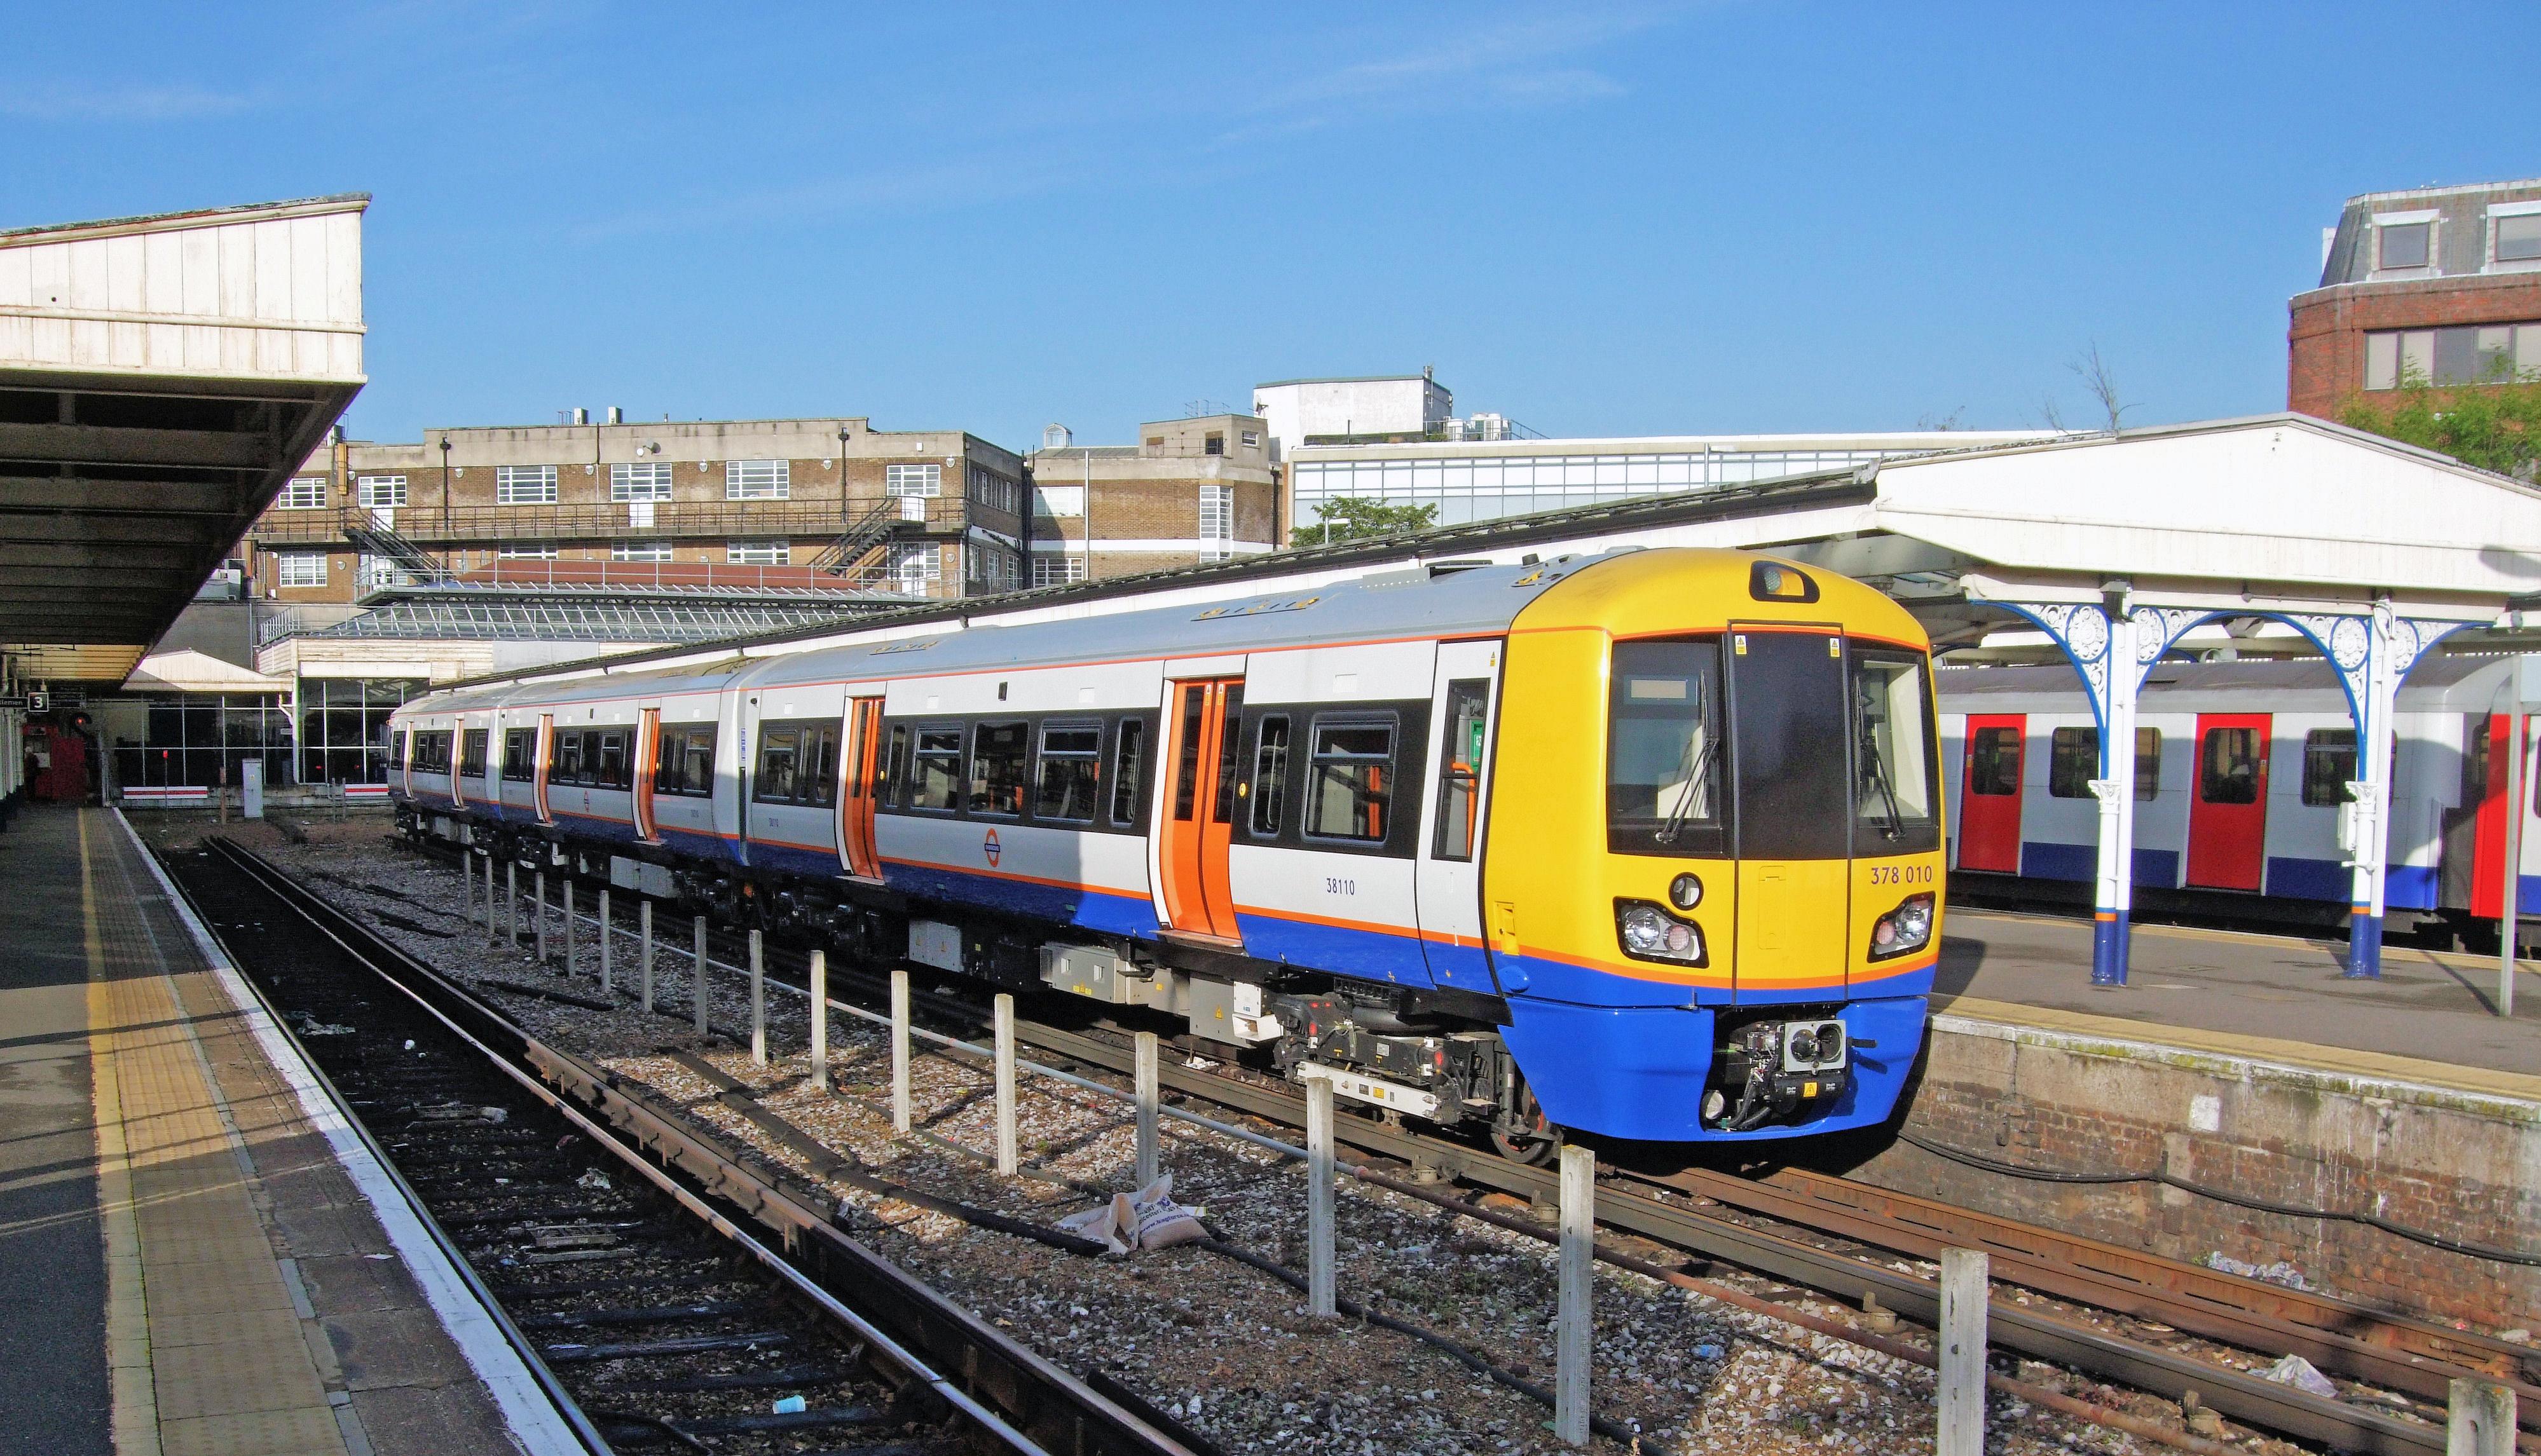 File:British Rail Class 378 Train in Richmond station, London-8Oct2009.jpg